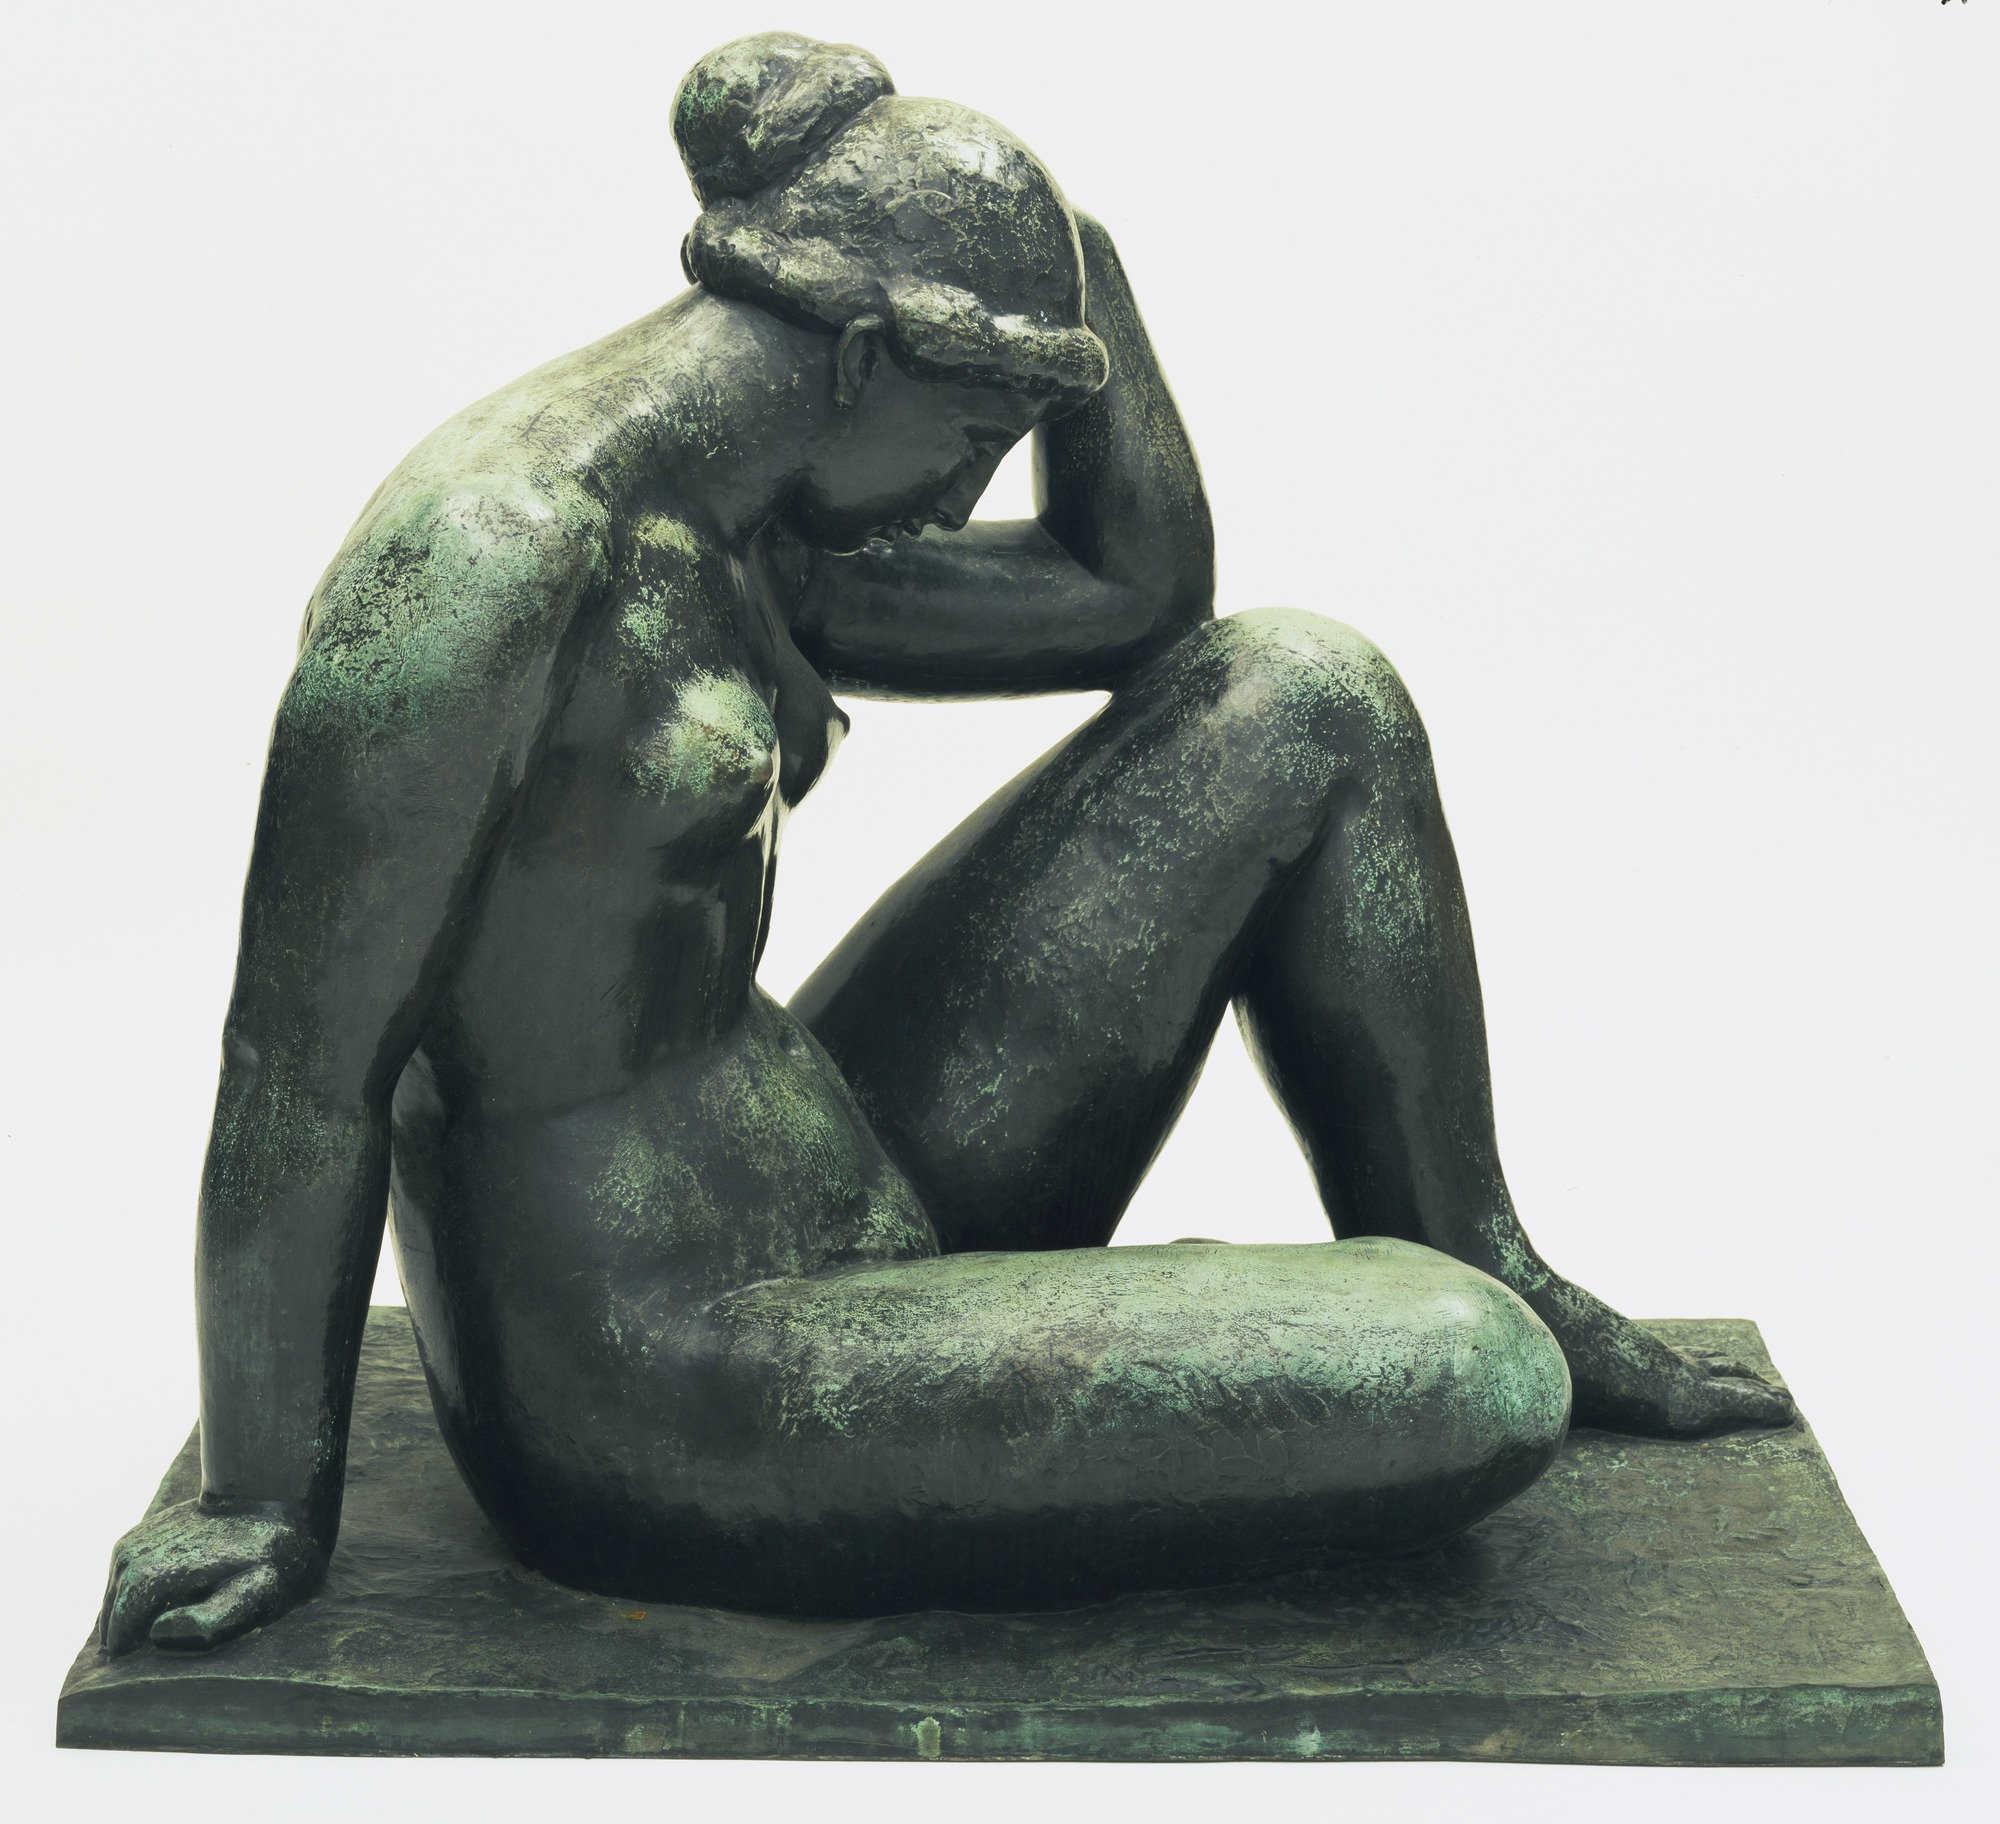 Aristide Maillol, Méditerranée, 1902–1905, 104 x 114,3 cm (Museum of Modern Art, New York)